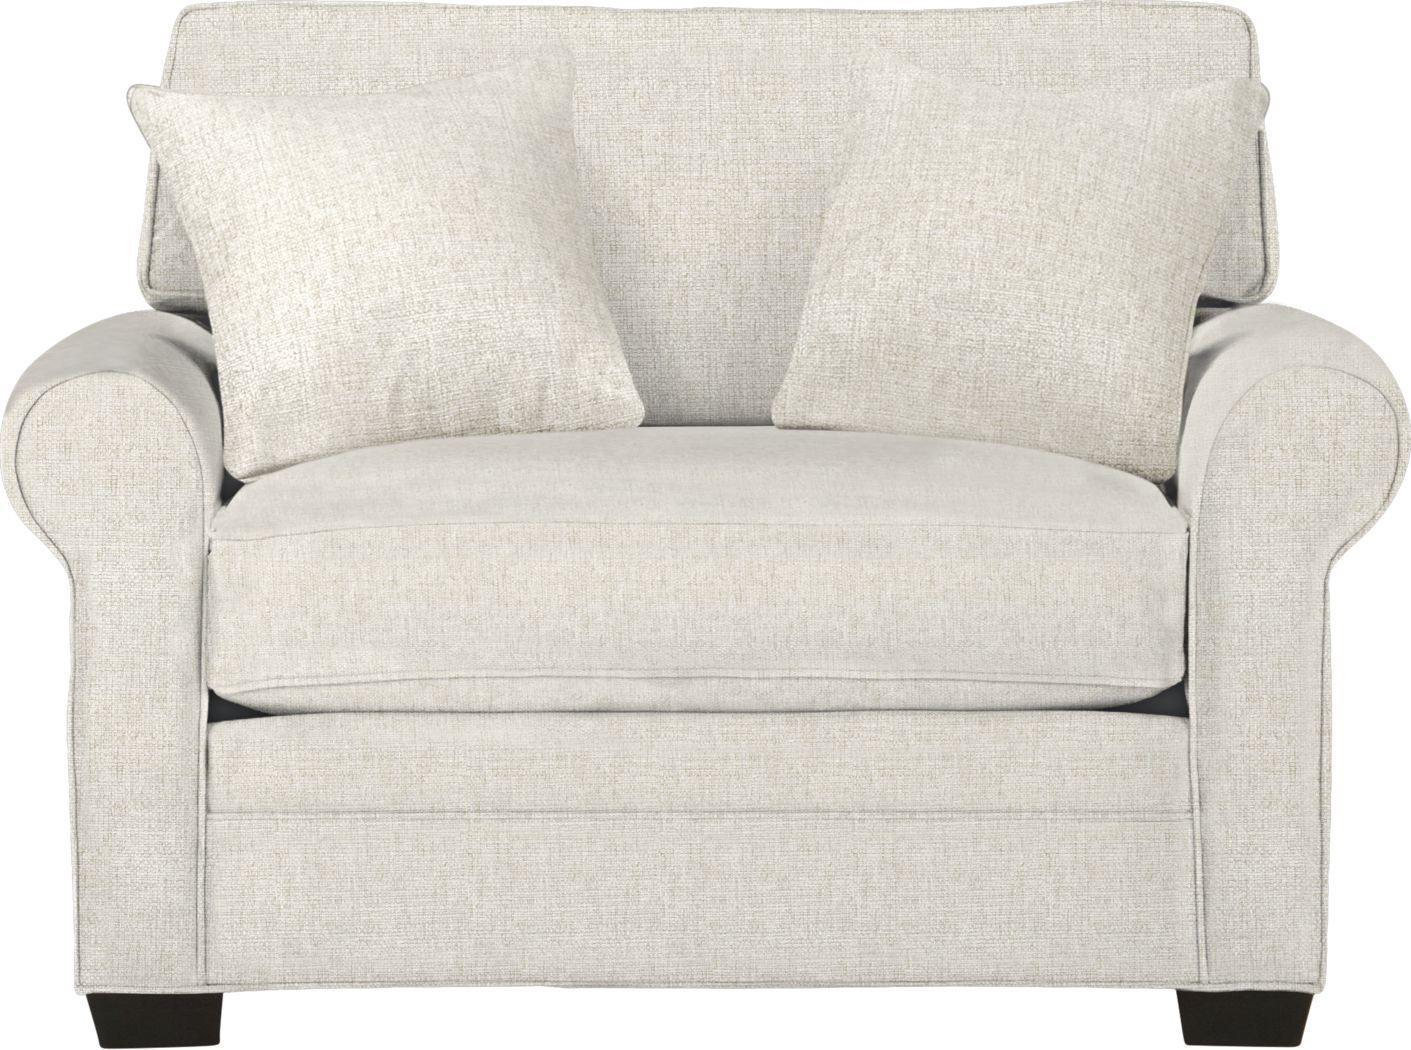 Cindy Crawford Home Bellingham Sand Textured Sleeper Chair Cindy Crawford Home Sleeper Chair Cindy Crawford